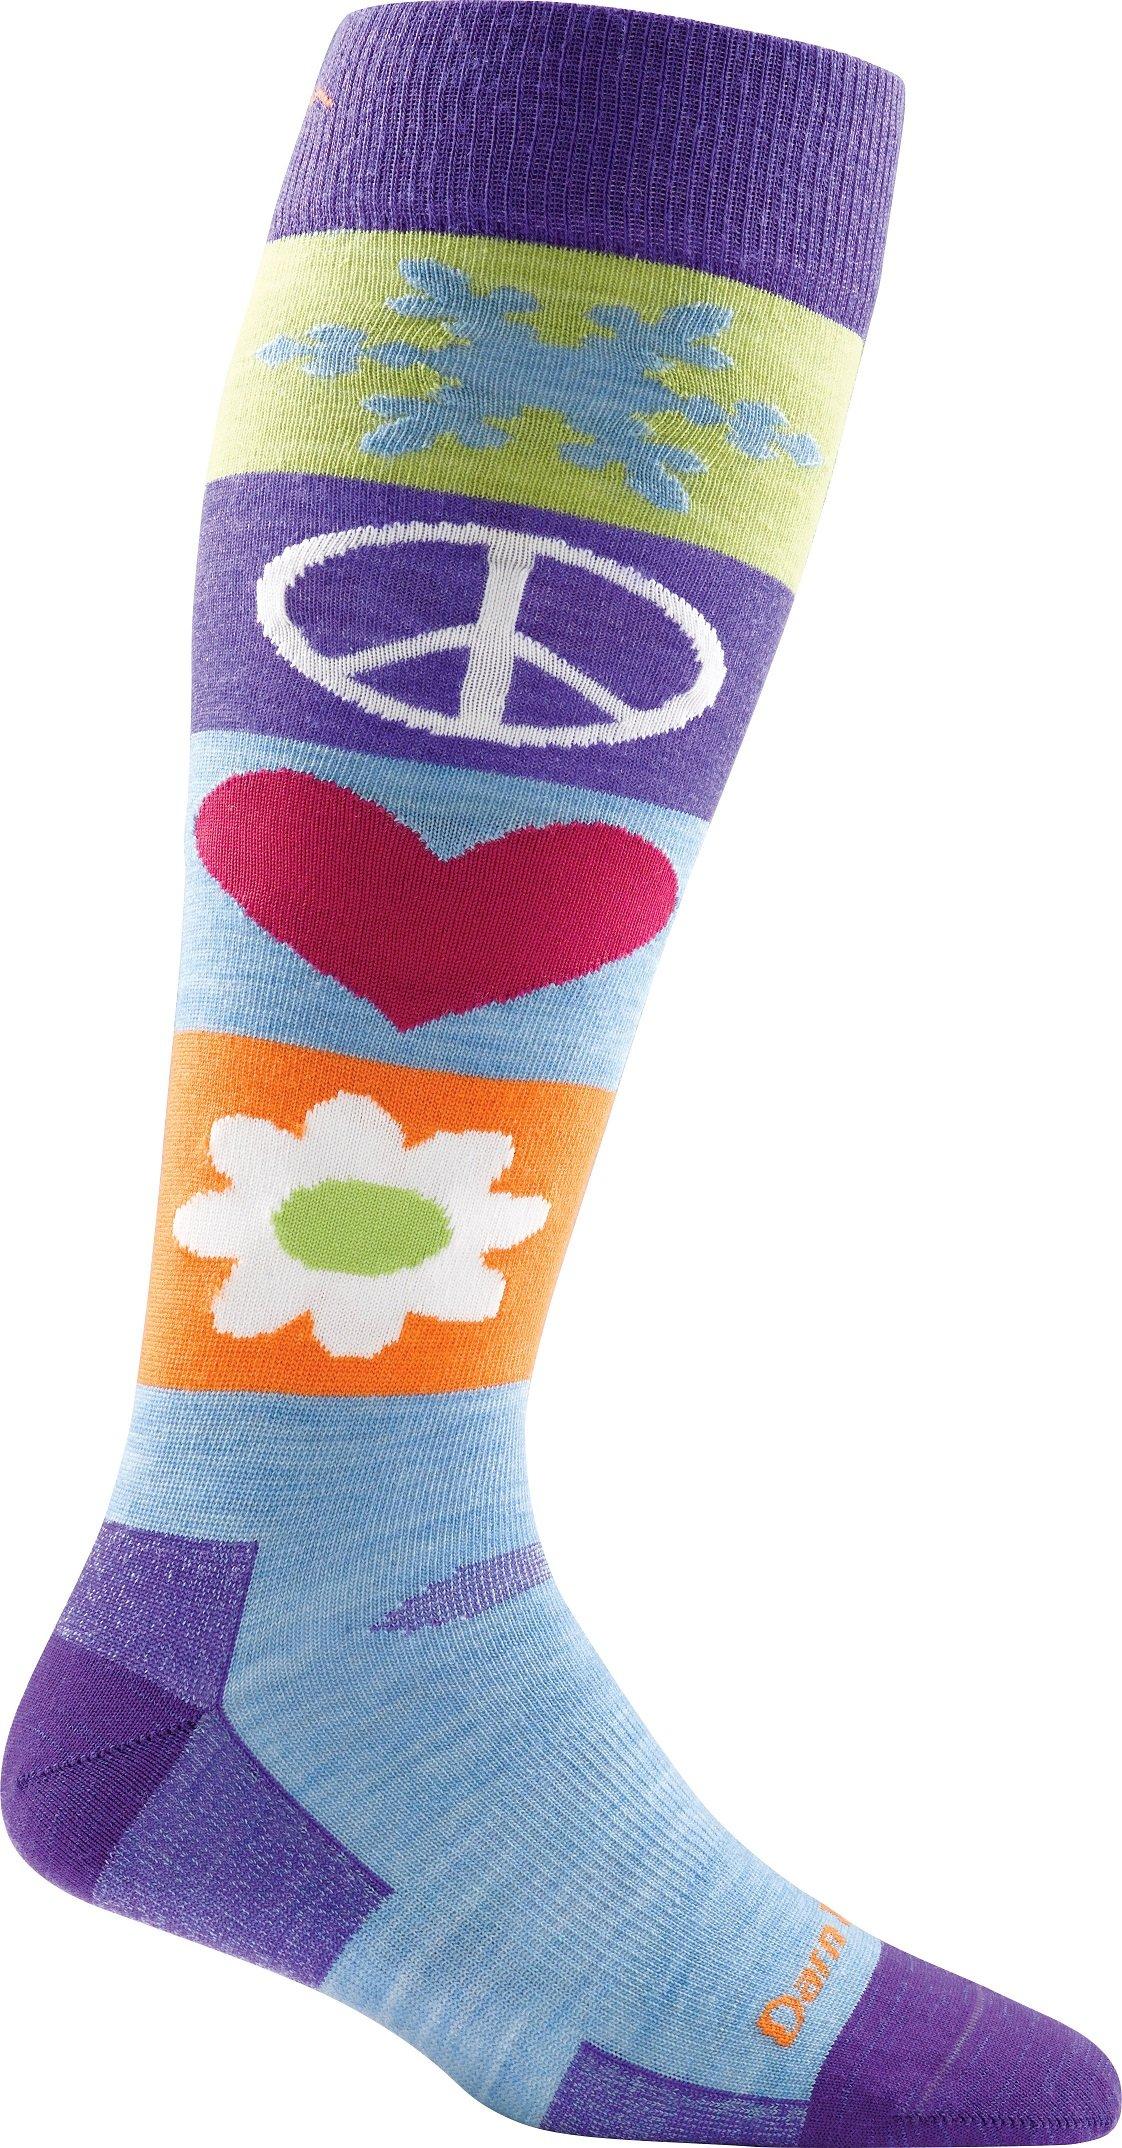 Darn Tough Peace Love Snow Cushion OTC Sock - Women's Majesty Large